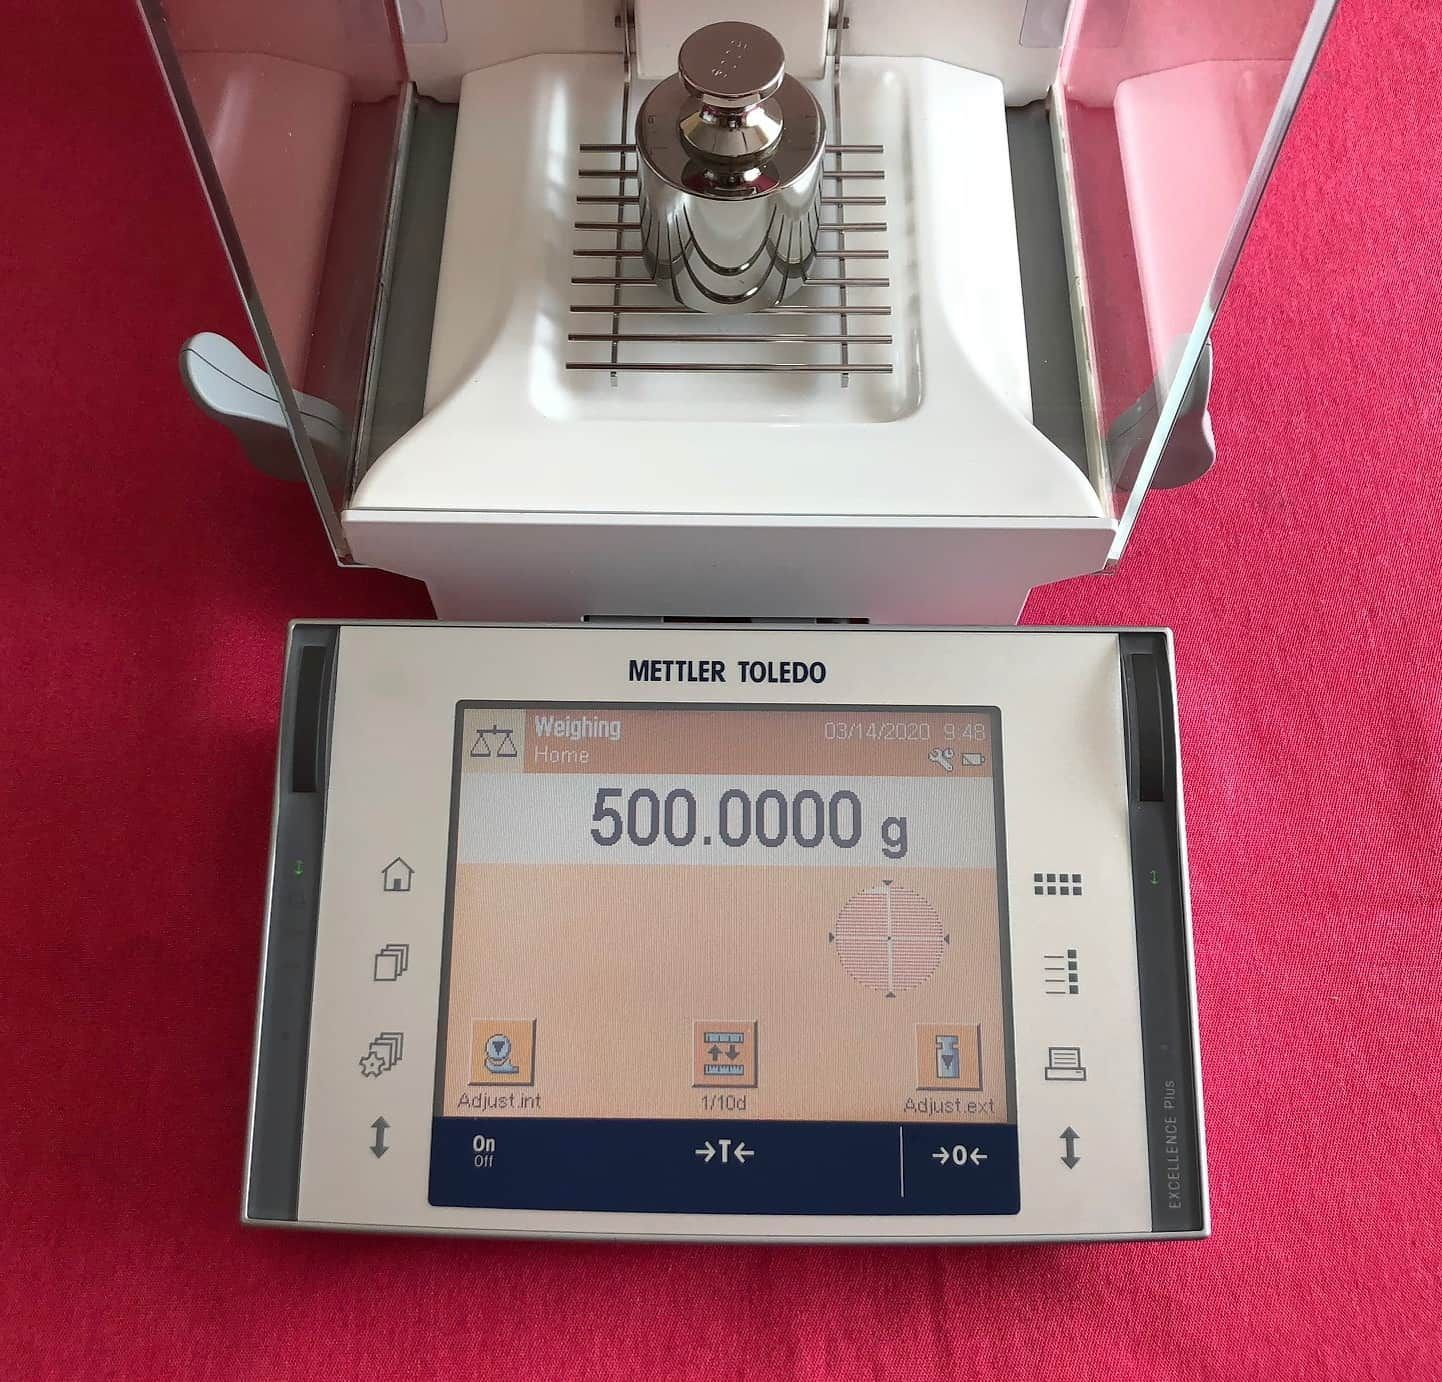 Mettler Toledo XP504 Analytical Balance Scale 520.0000g